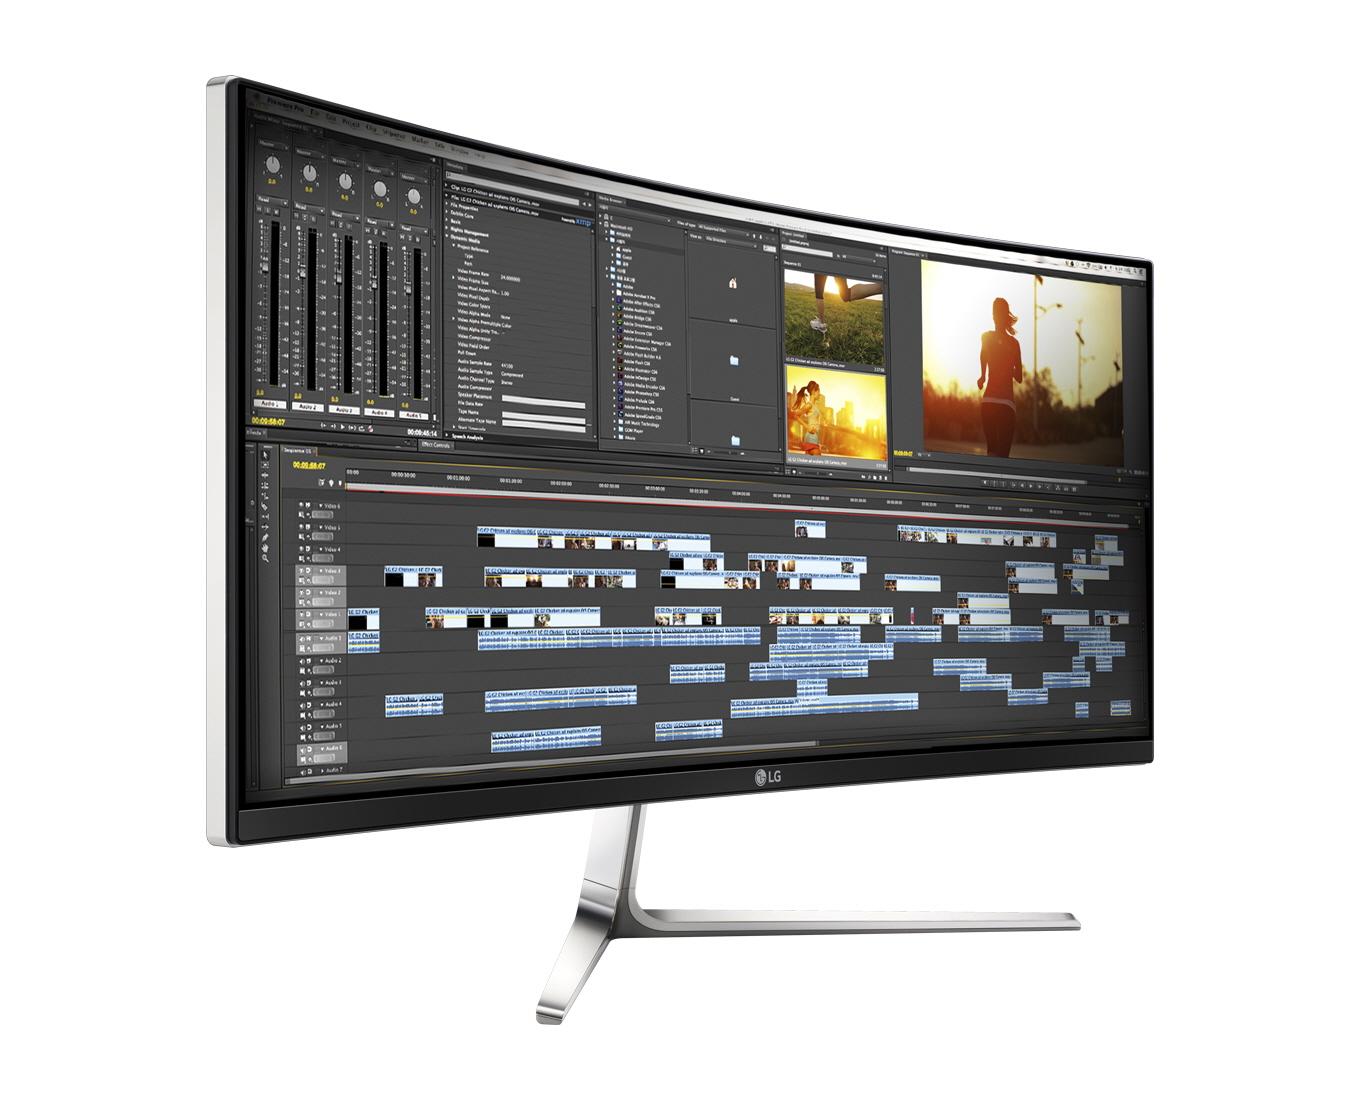 LG 34UC97-S Ultrawide Bildschirm Homeoffice Büro 21:9